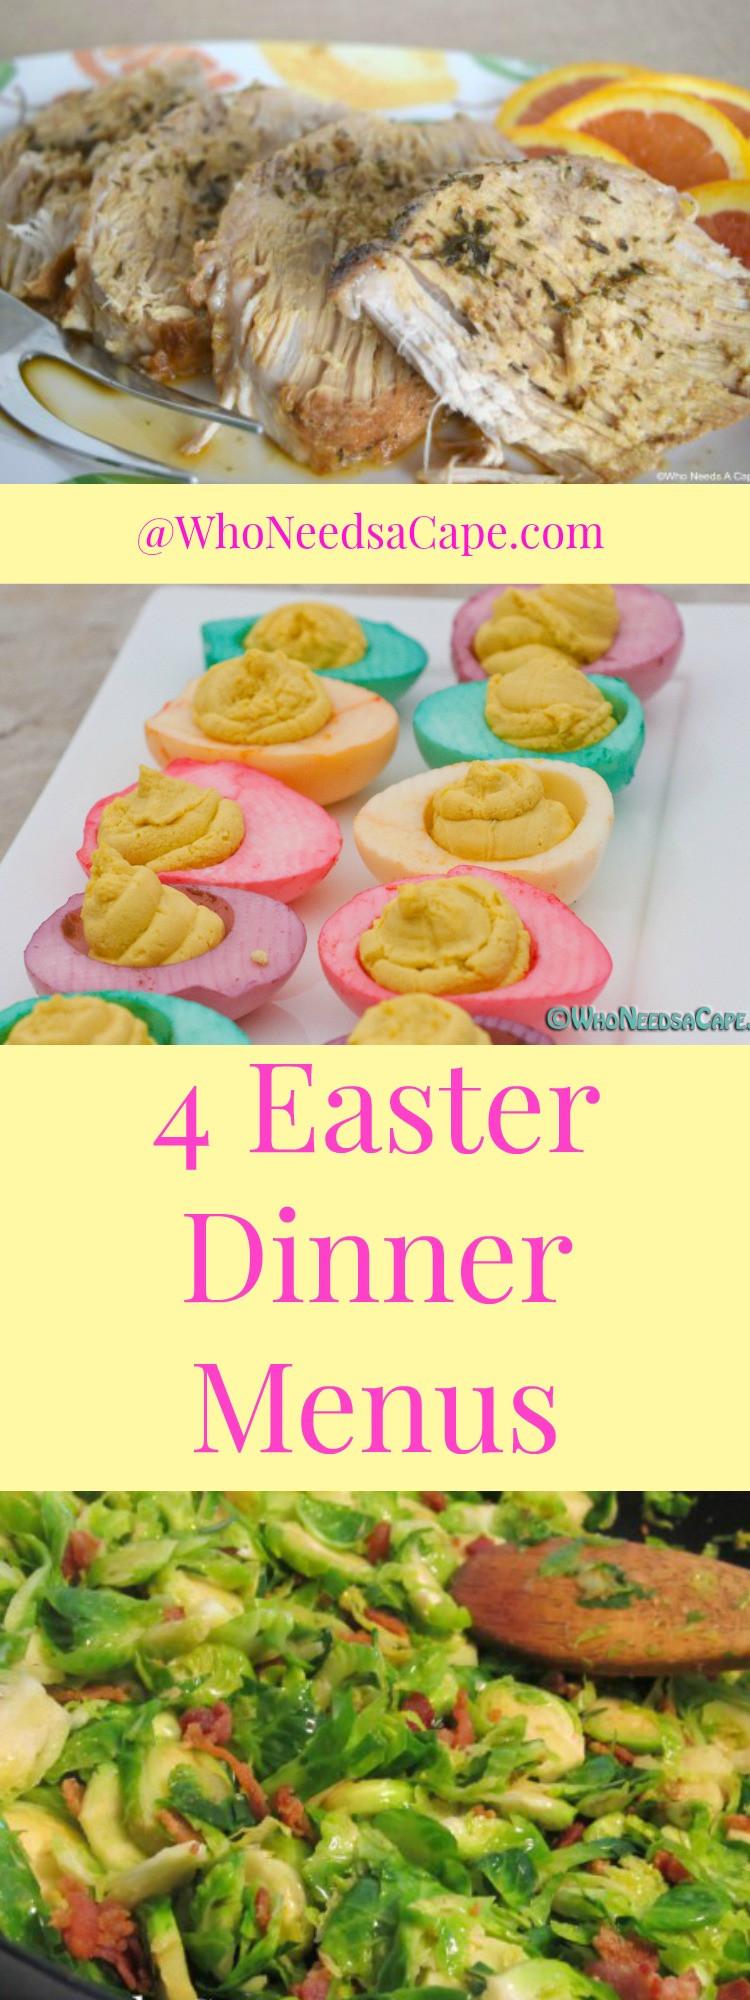 Menu For Easter Dinner  Easter Dinner Menus Who Needs A Cape